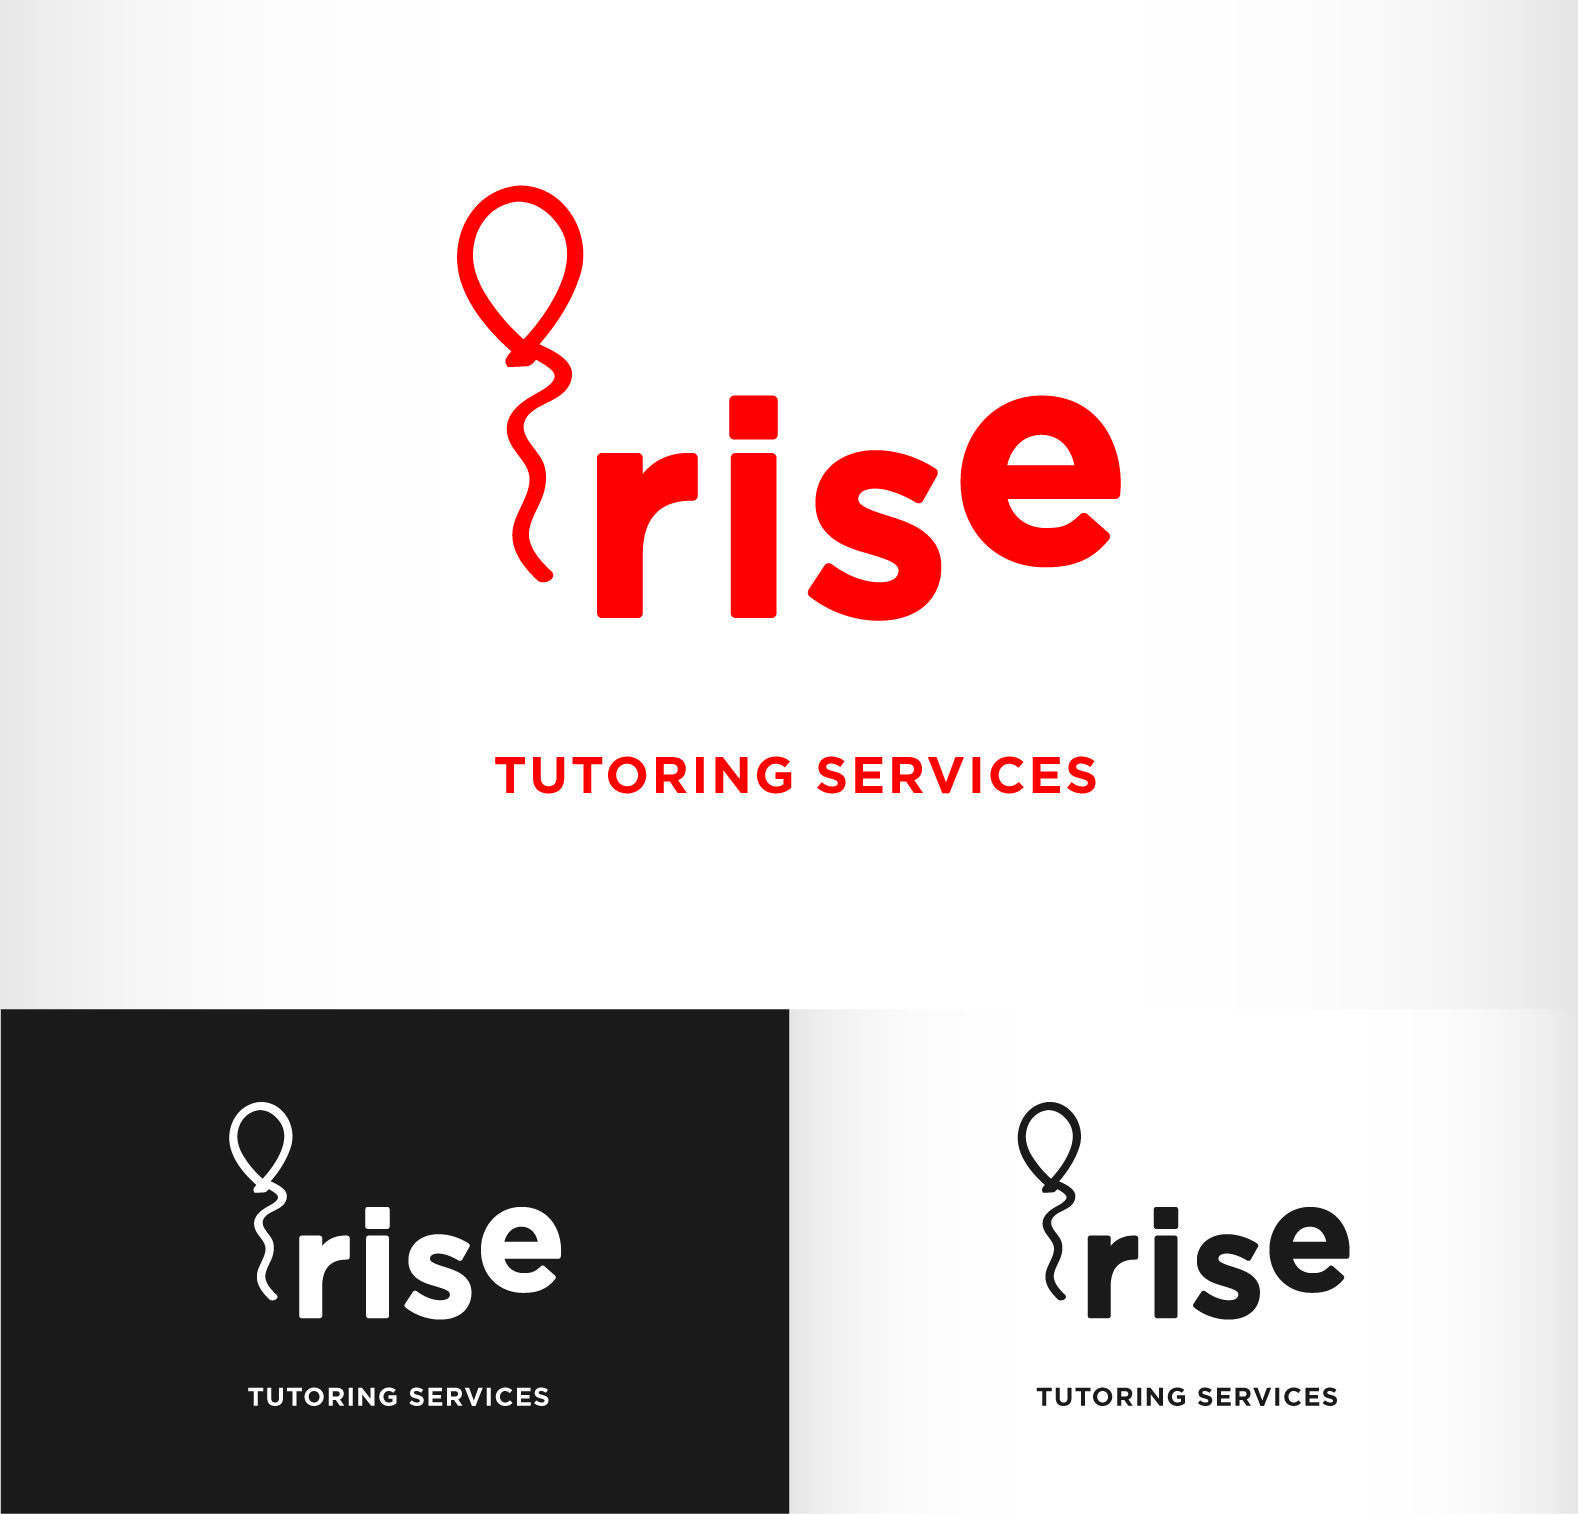 Logo Design by Andrés González - Entry No. 184 in the Logo Design Contest Imaginative Logo Design for Rise Tutoring Service.